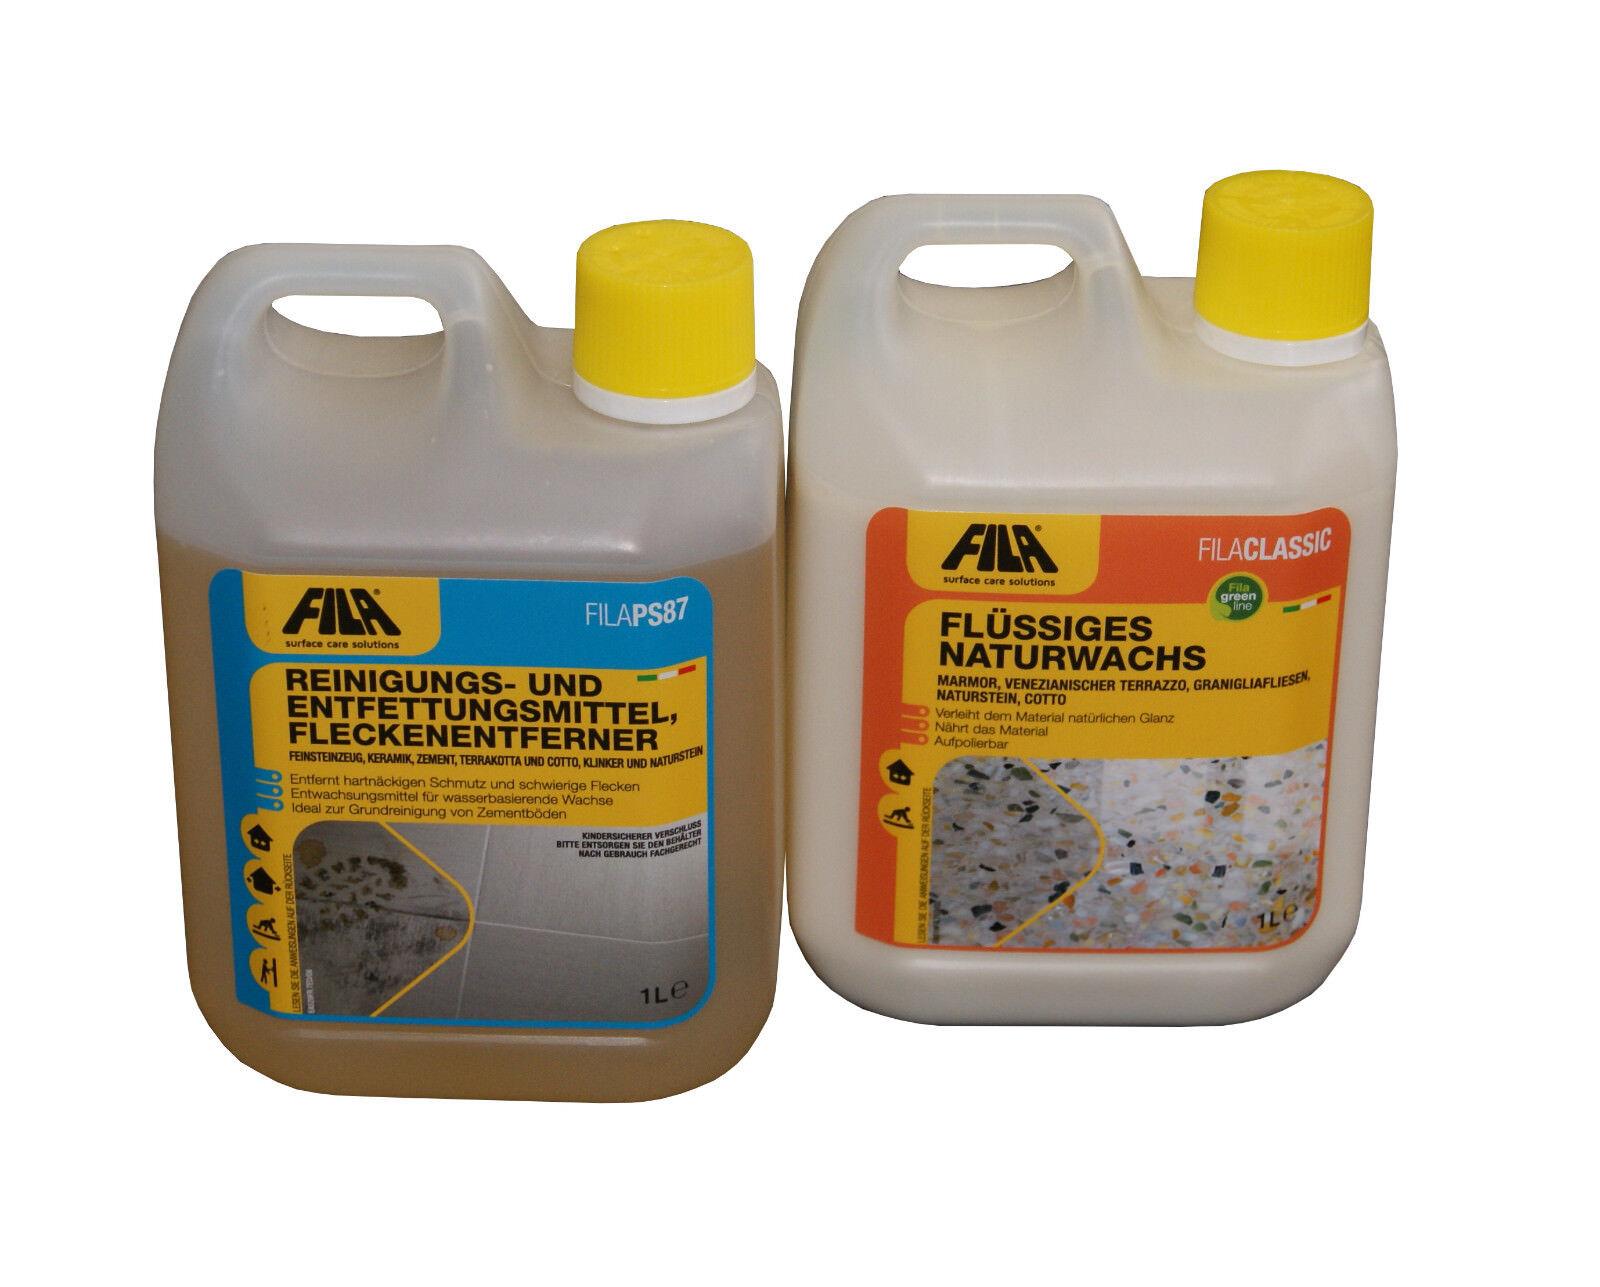 FILA SET 7 CLEANING + MAINTENANCE: Fila PS87 1l + Fila Classic 1l